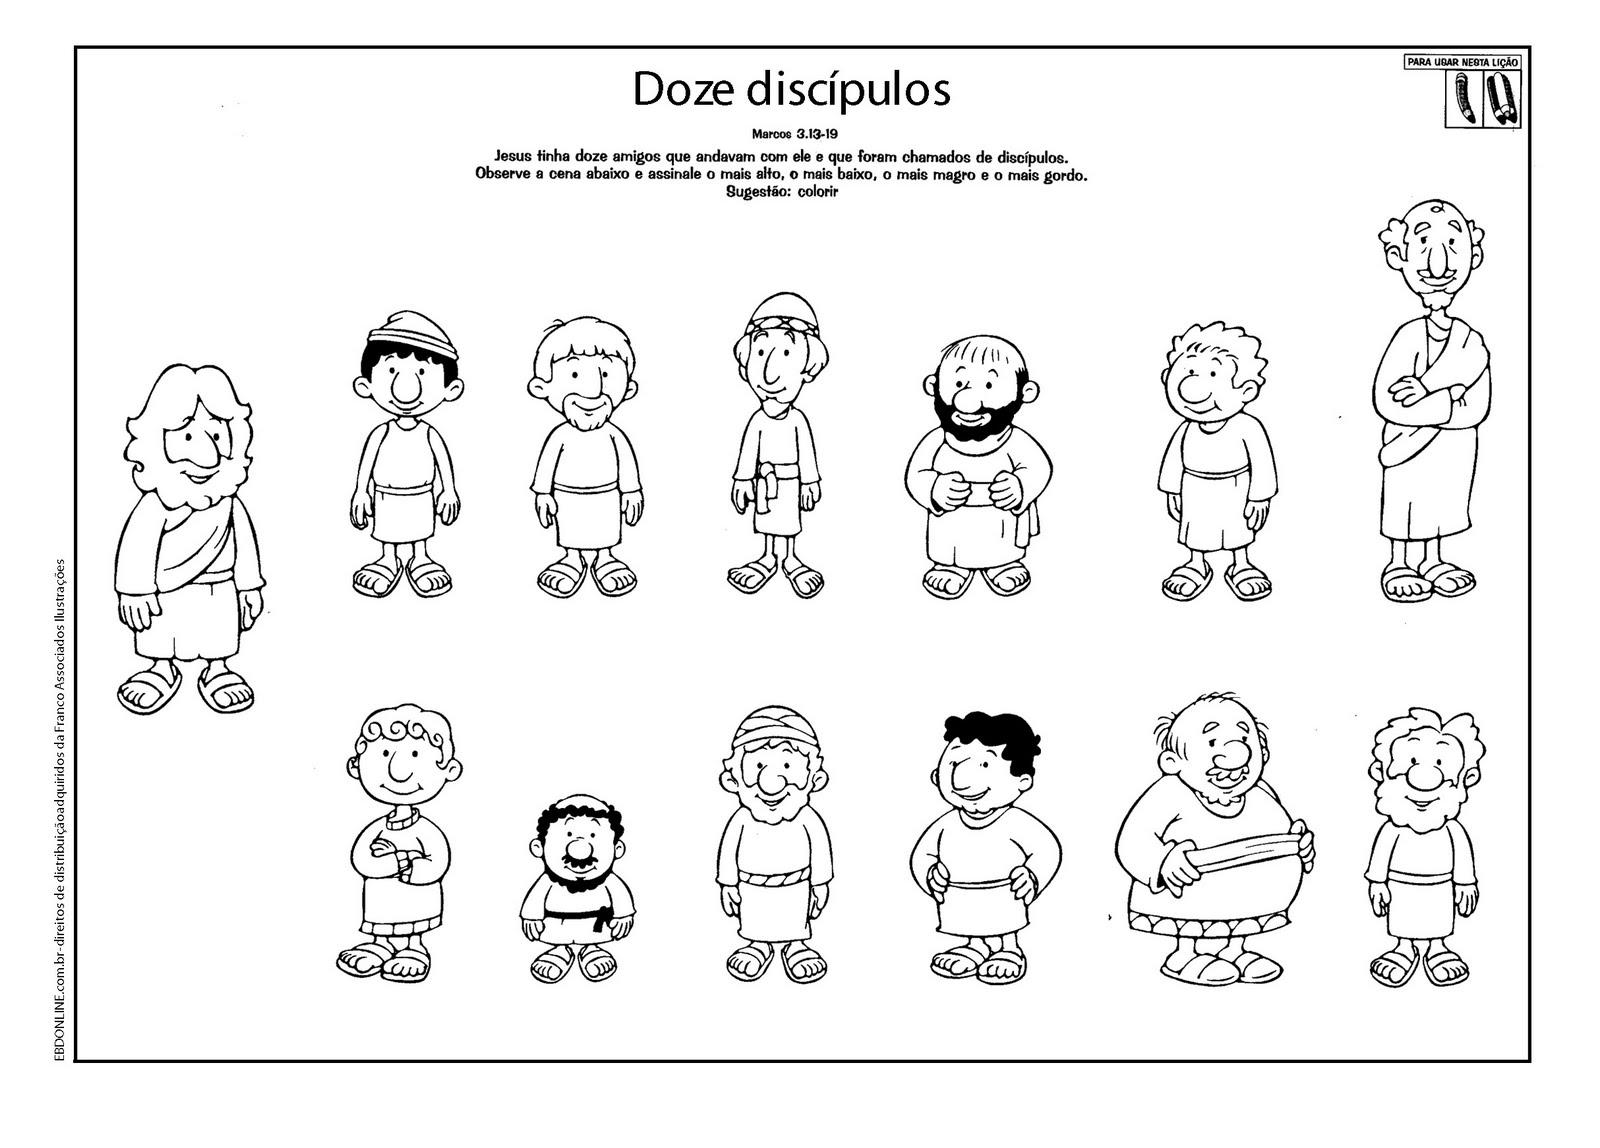 AULAS PARA EVANGELIZAO INFANTIL APSTOLOS OU DISCPULOS